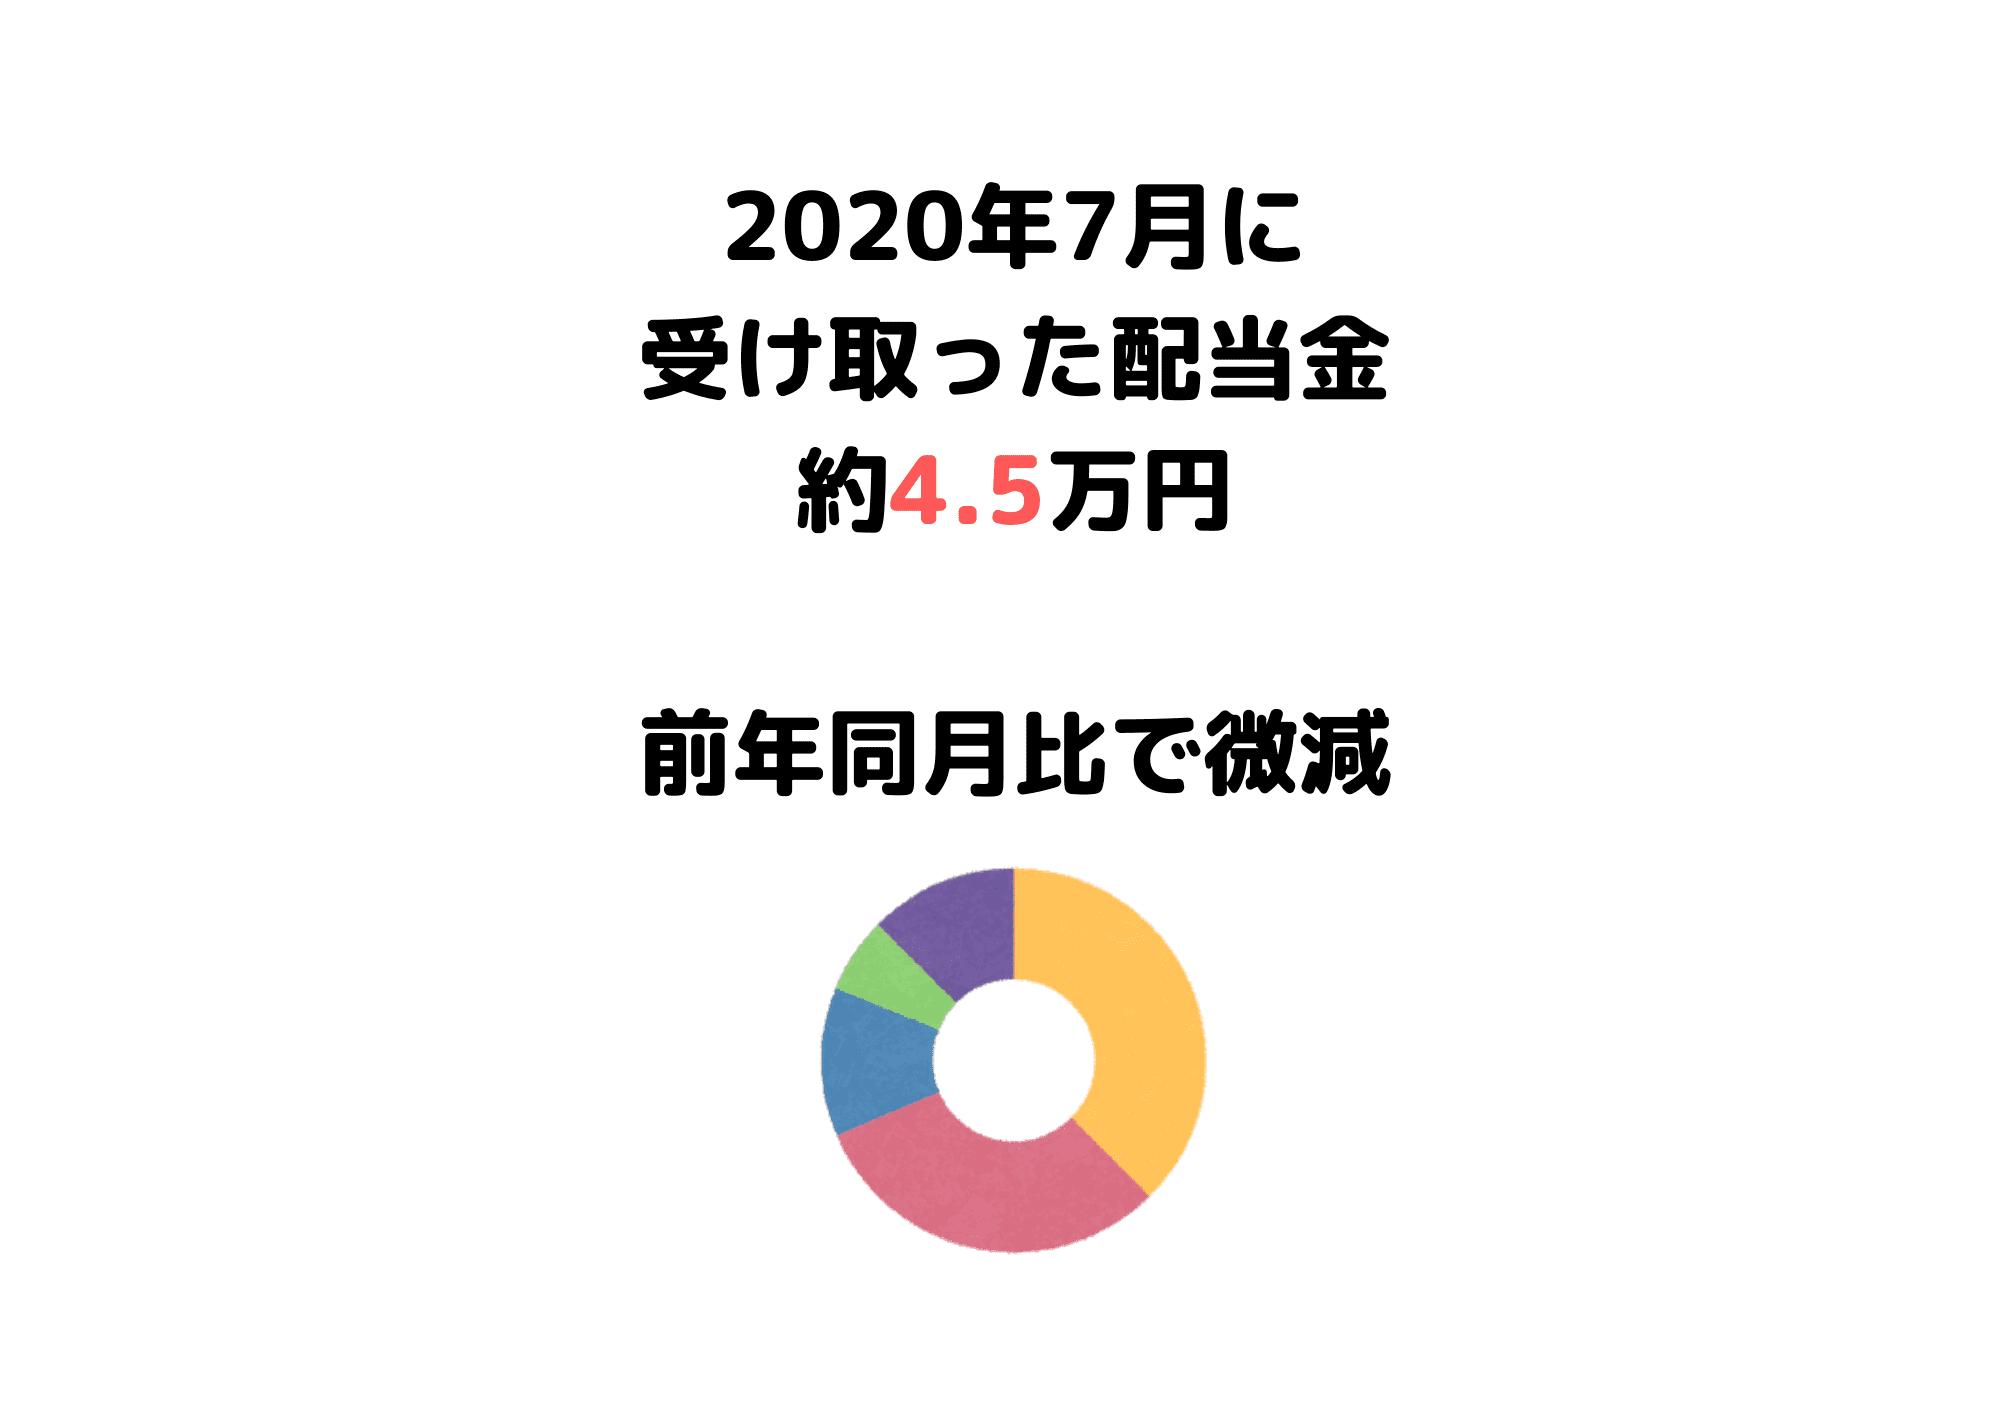 受取配当金 20年7月 (1)